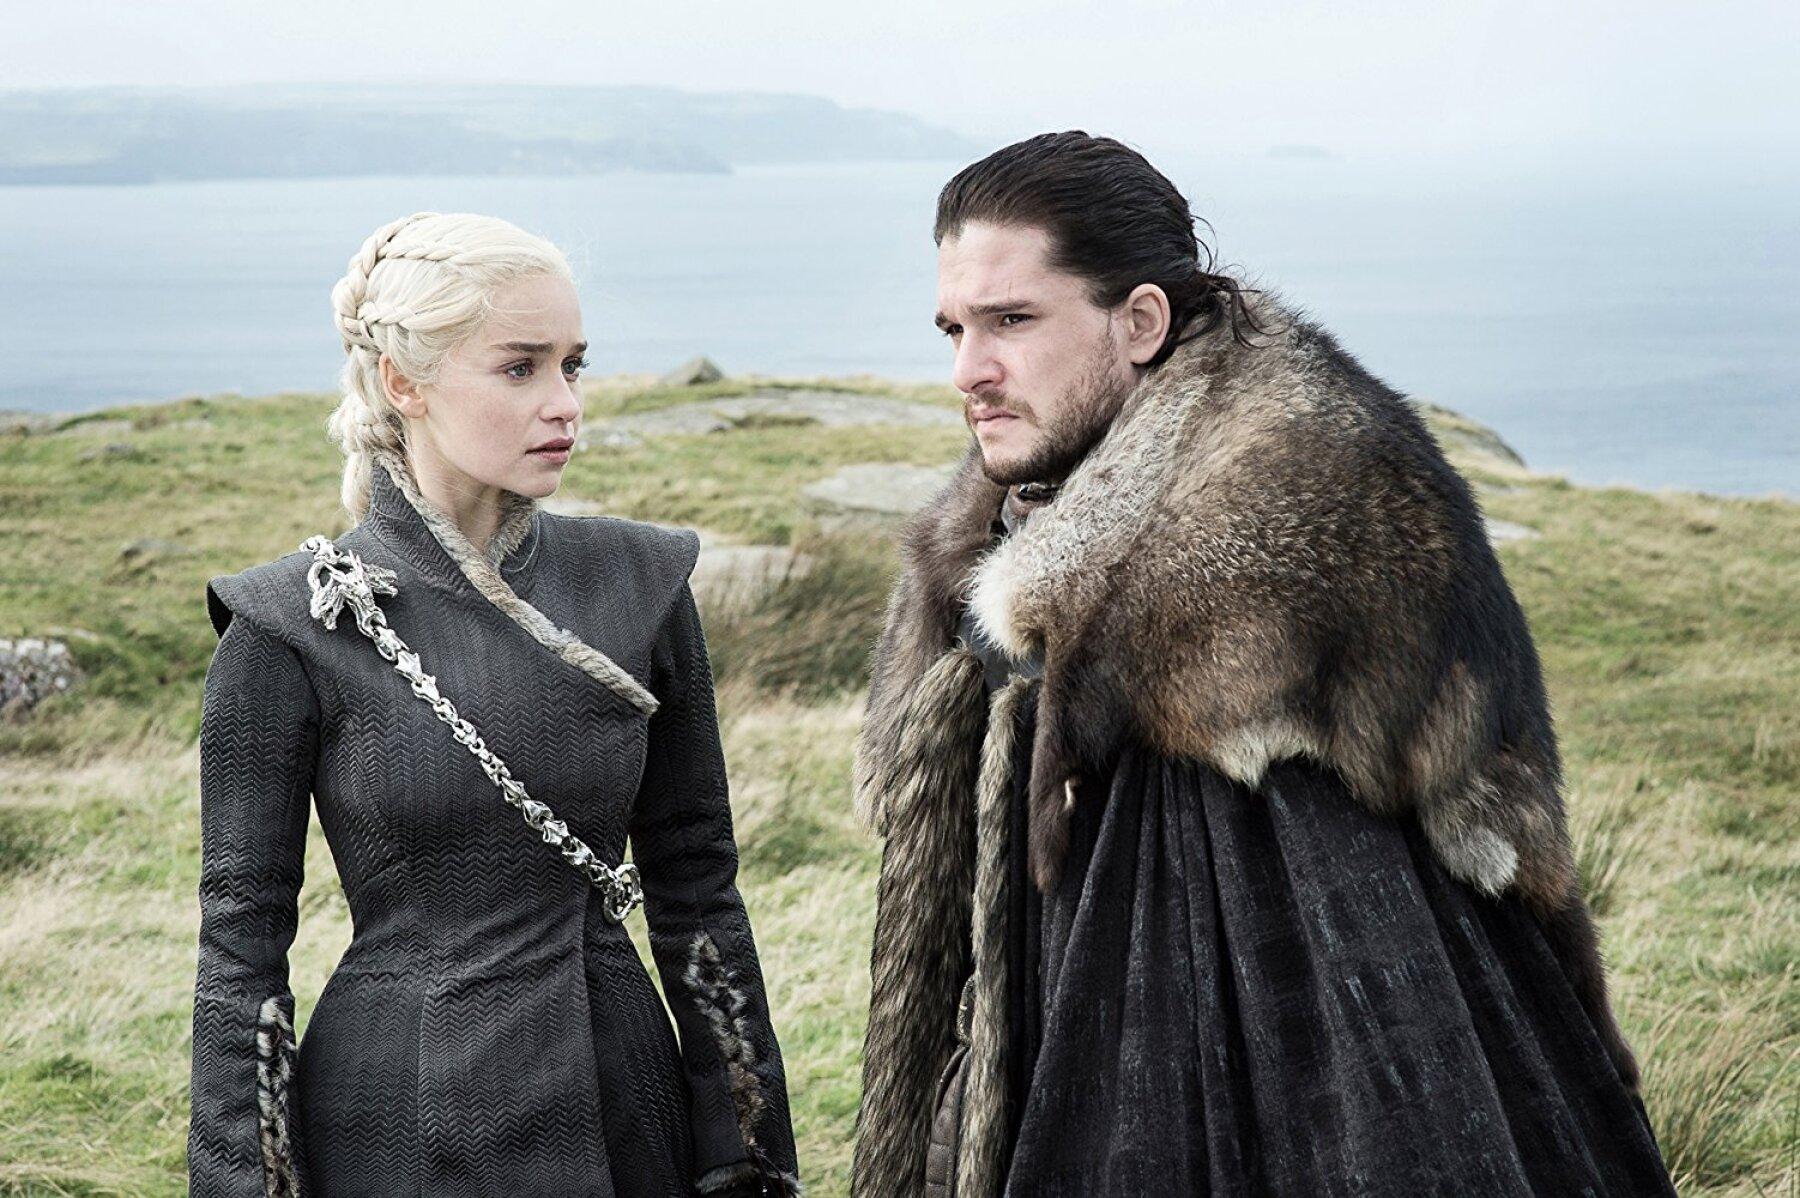 Jon y Daenerys